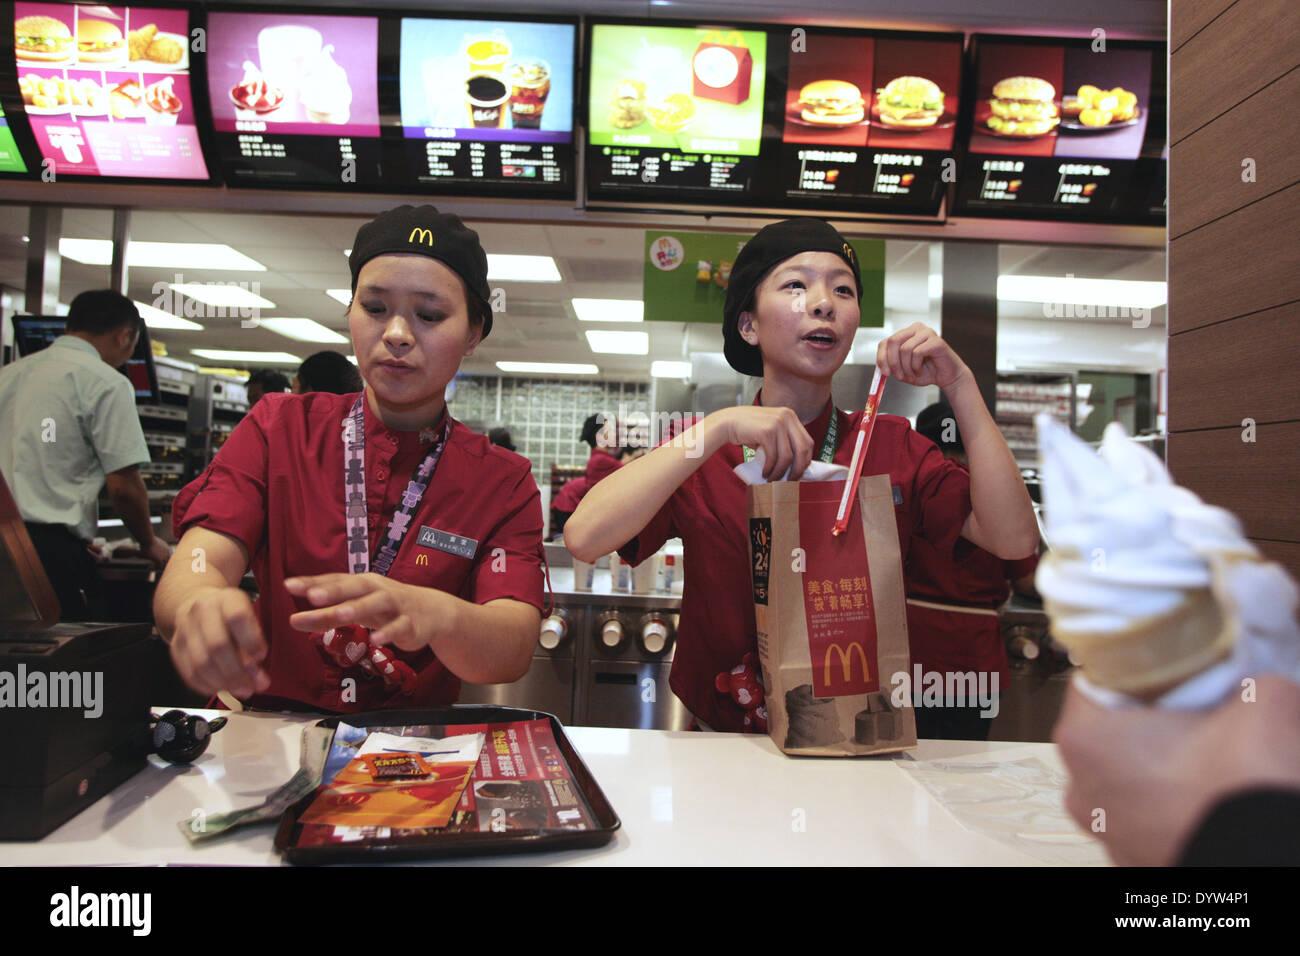 Mcdonalds staff serves food to customer - Stock Image